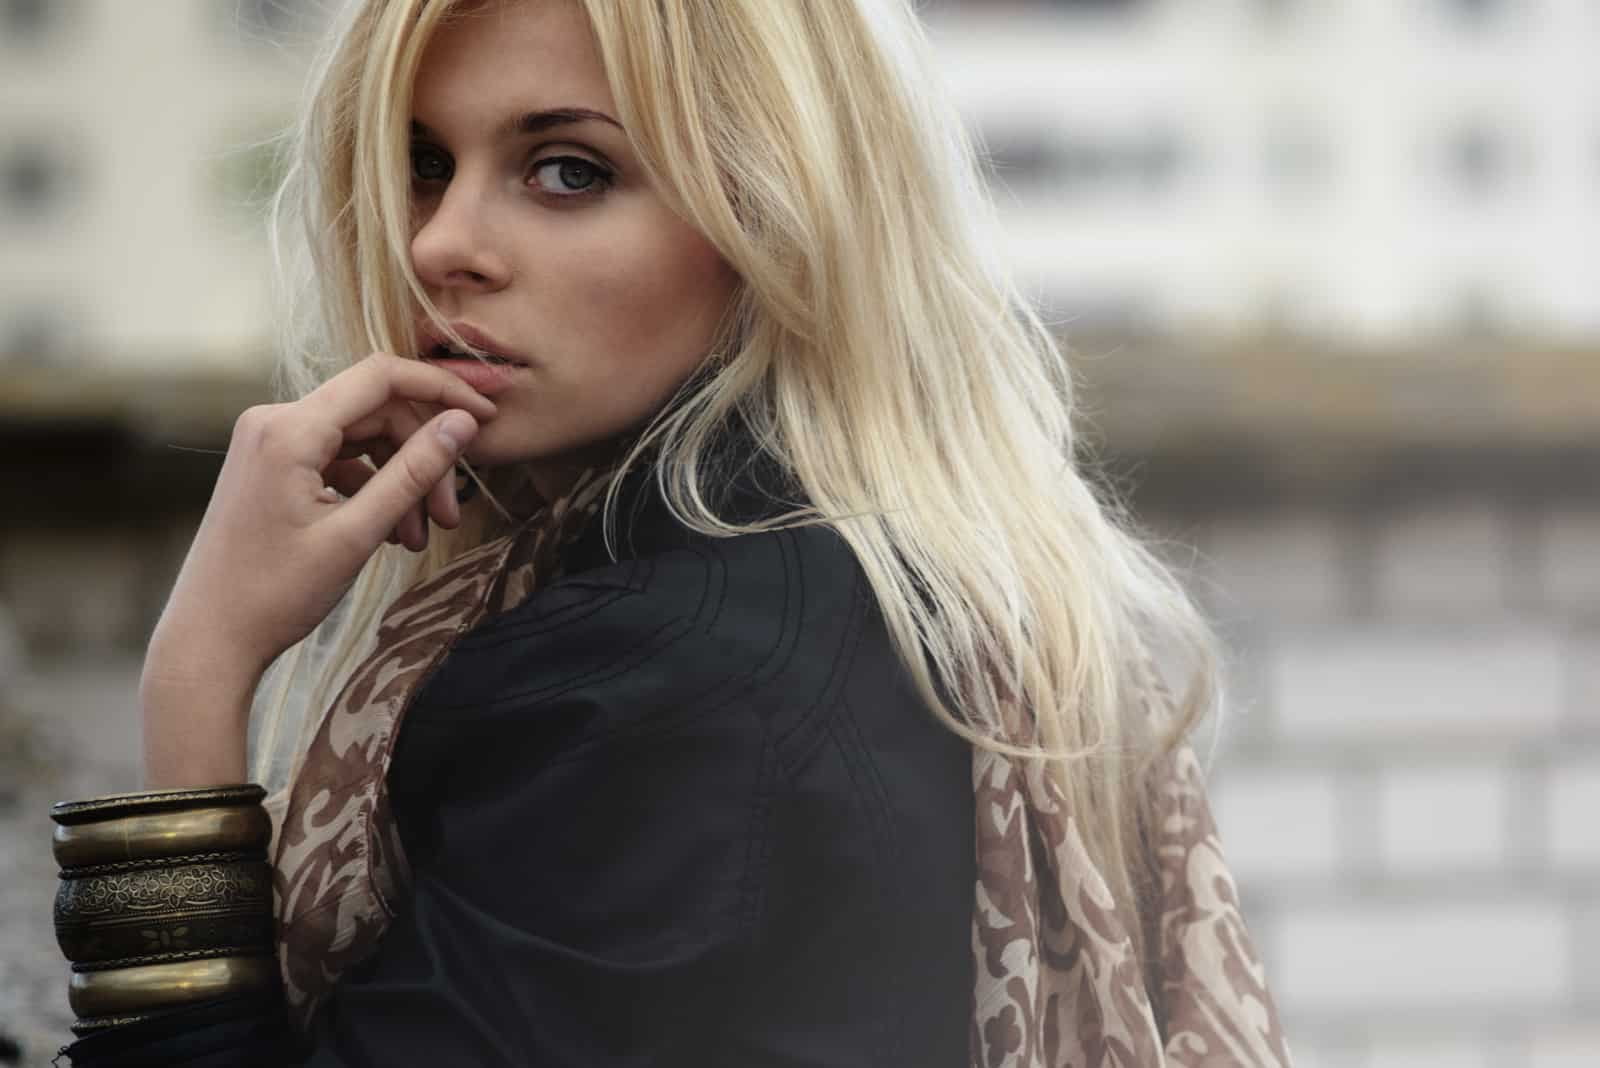 femme blonde en plein air dans la rue